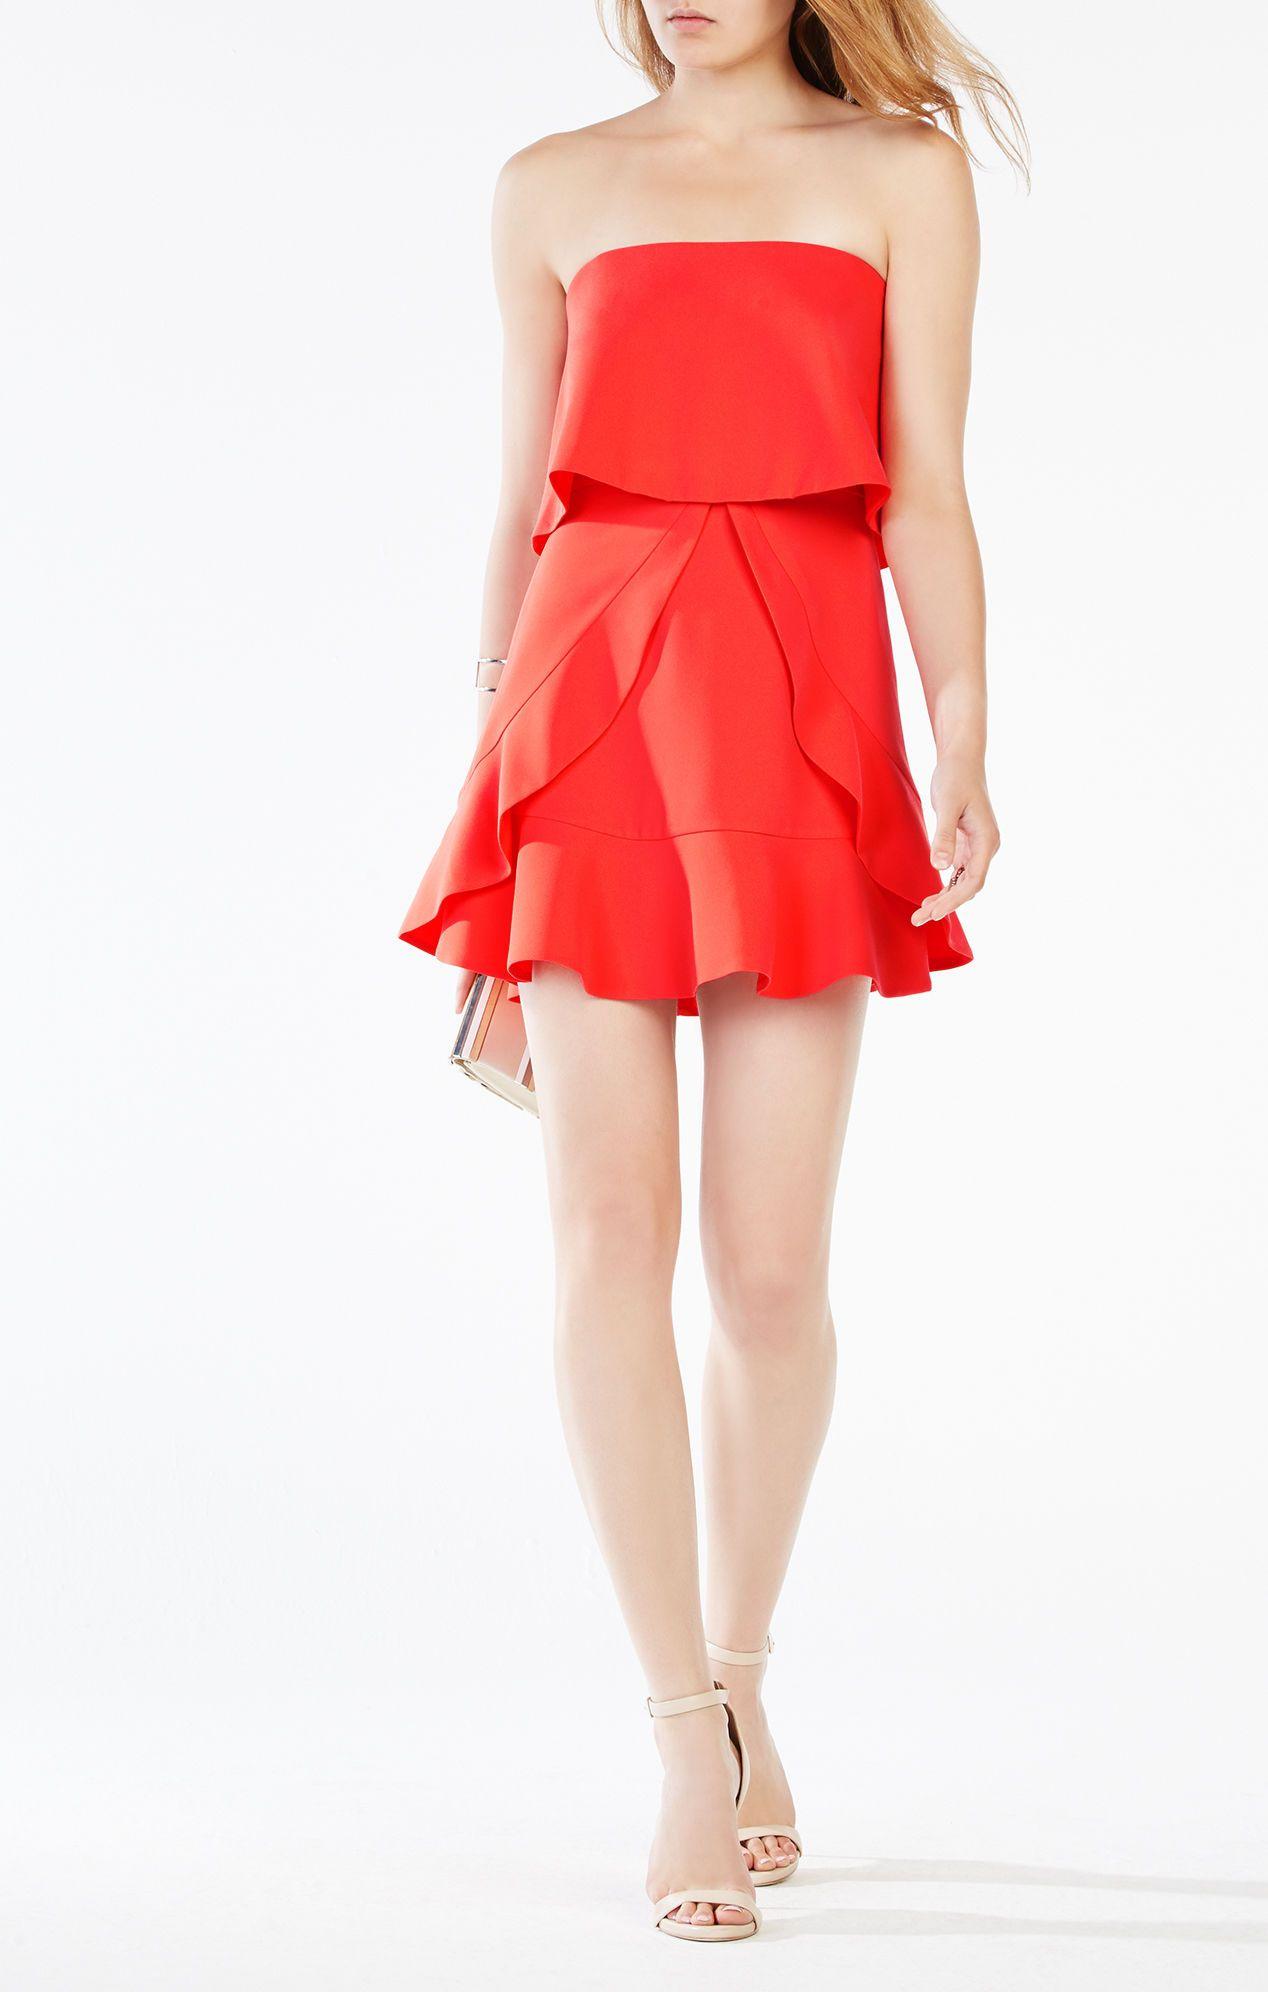 Charlot Strapless Ruffle Dress Strapless Ruffle Dress Red Cocktail Dress Red Ruffle Dress [ 1992 x 1268 Pixel ]